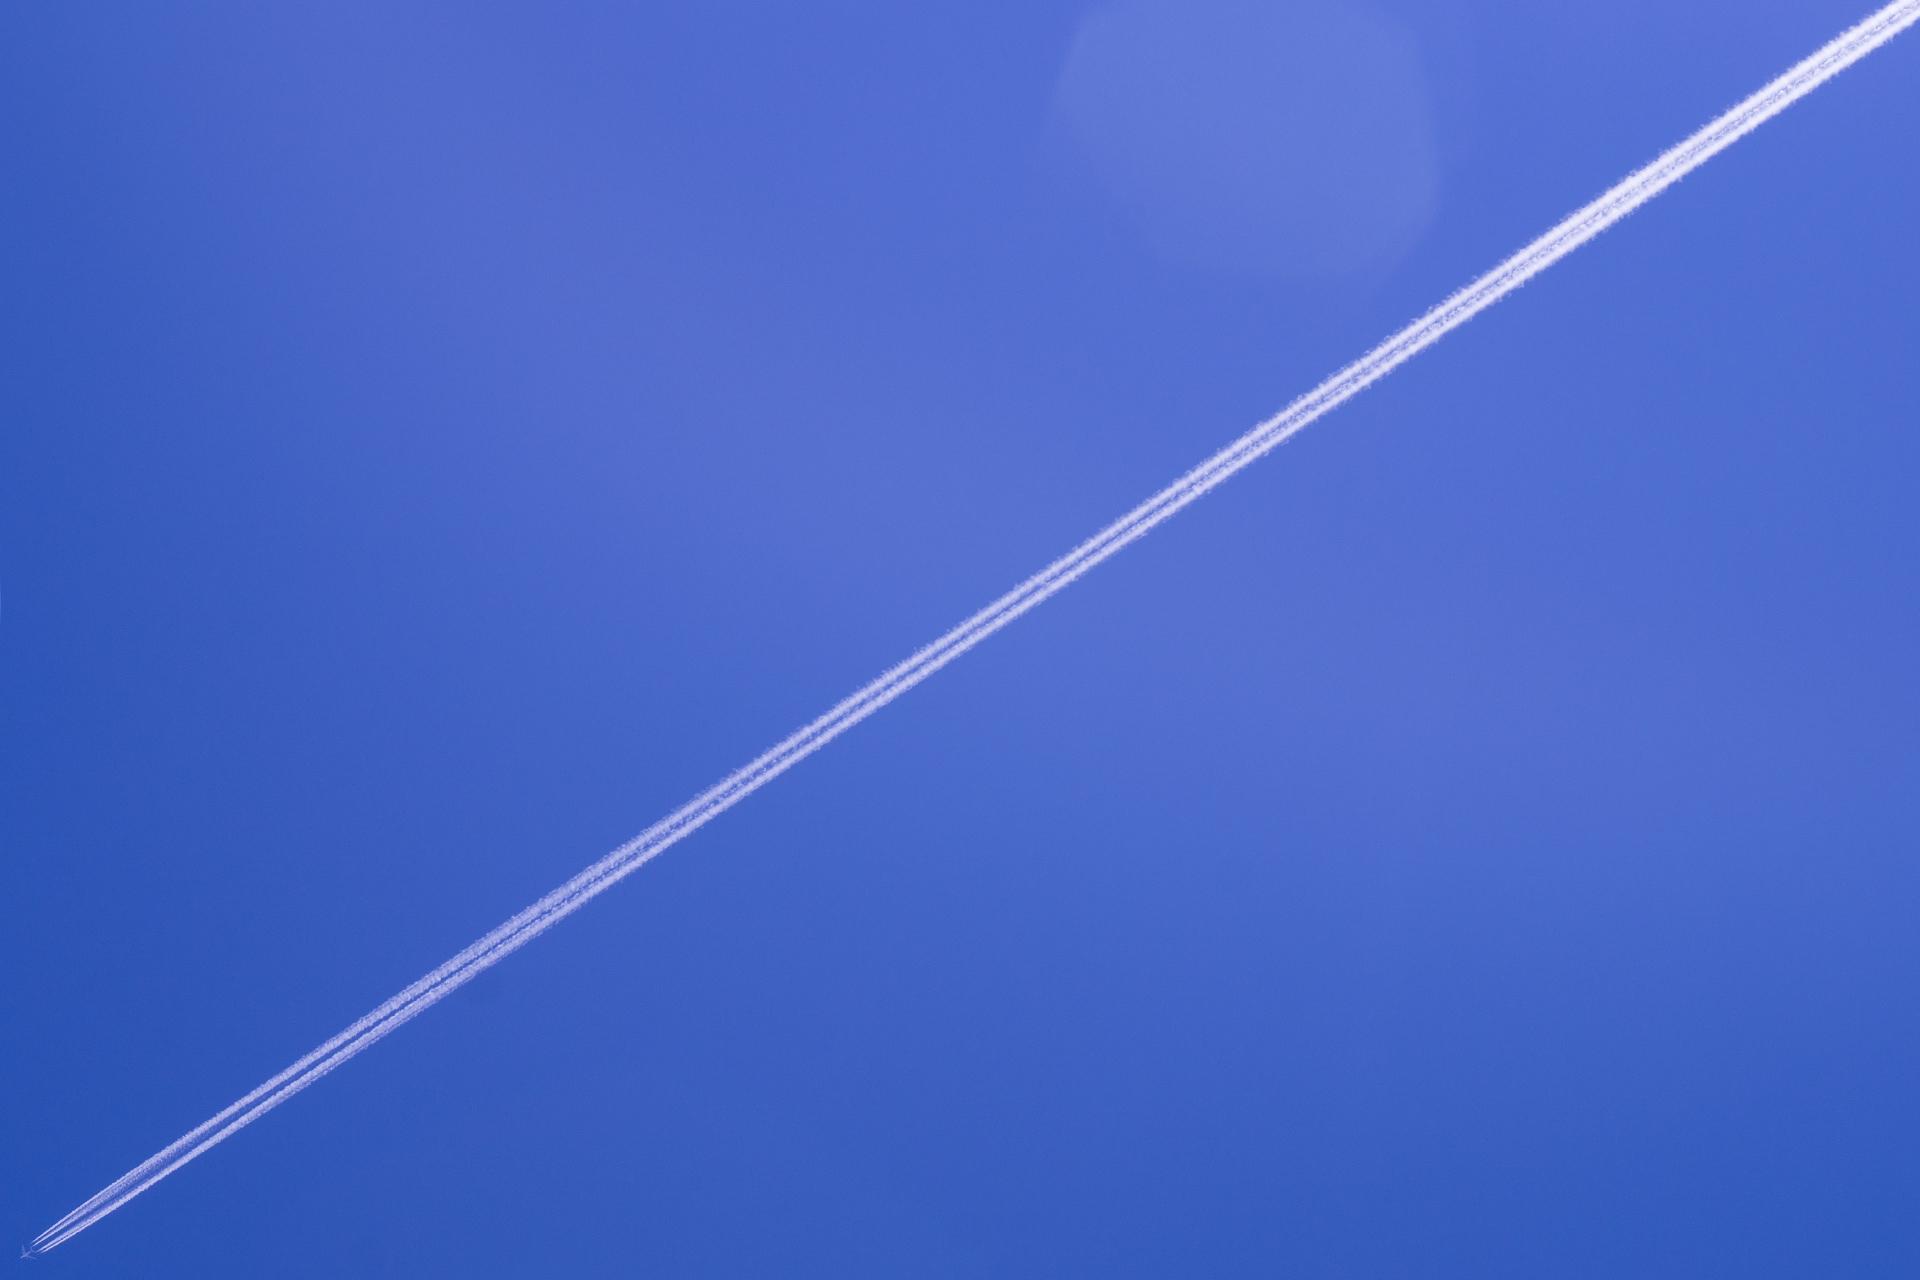 General 1920x1280 sky sky blue airplane contrails minimalism